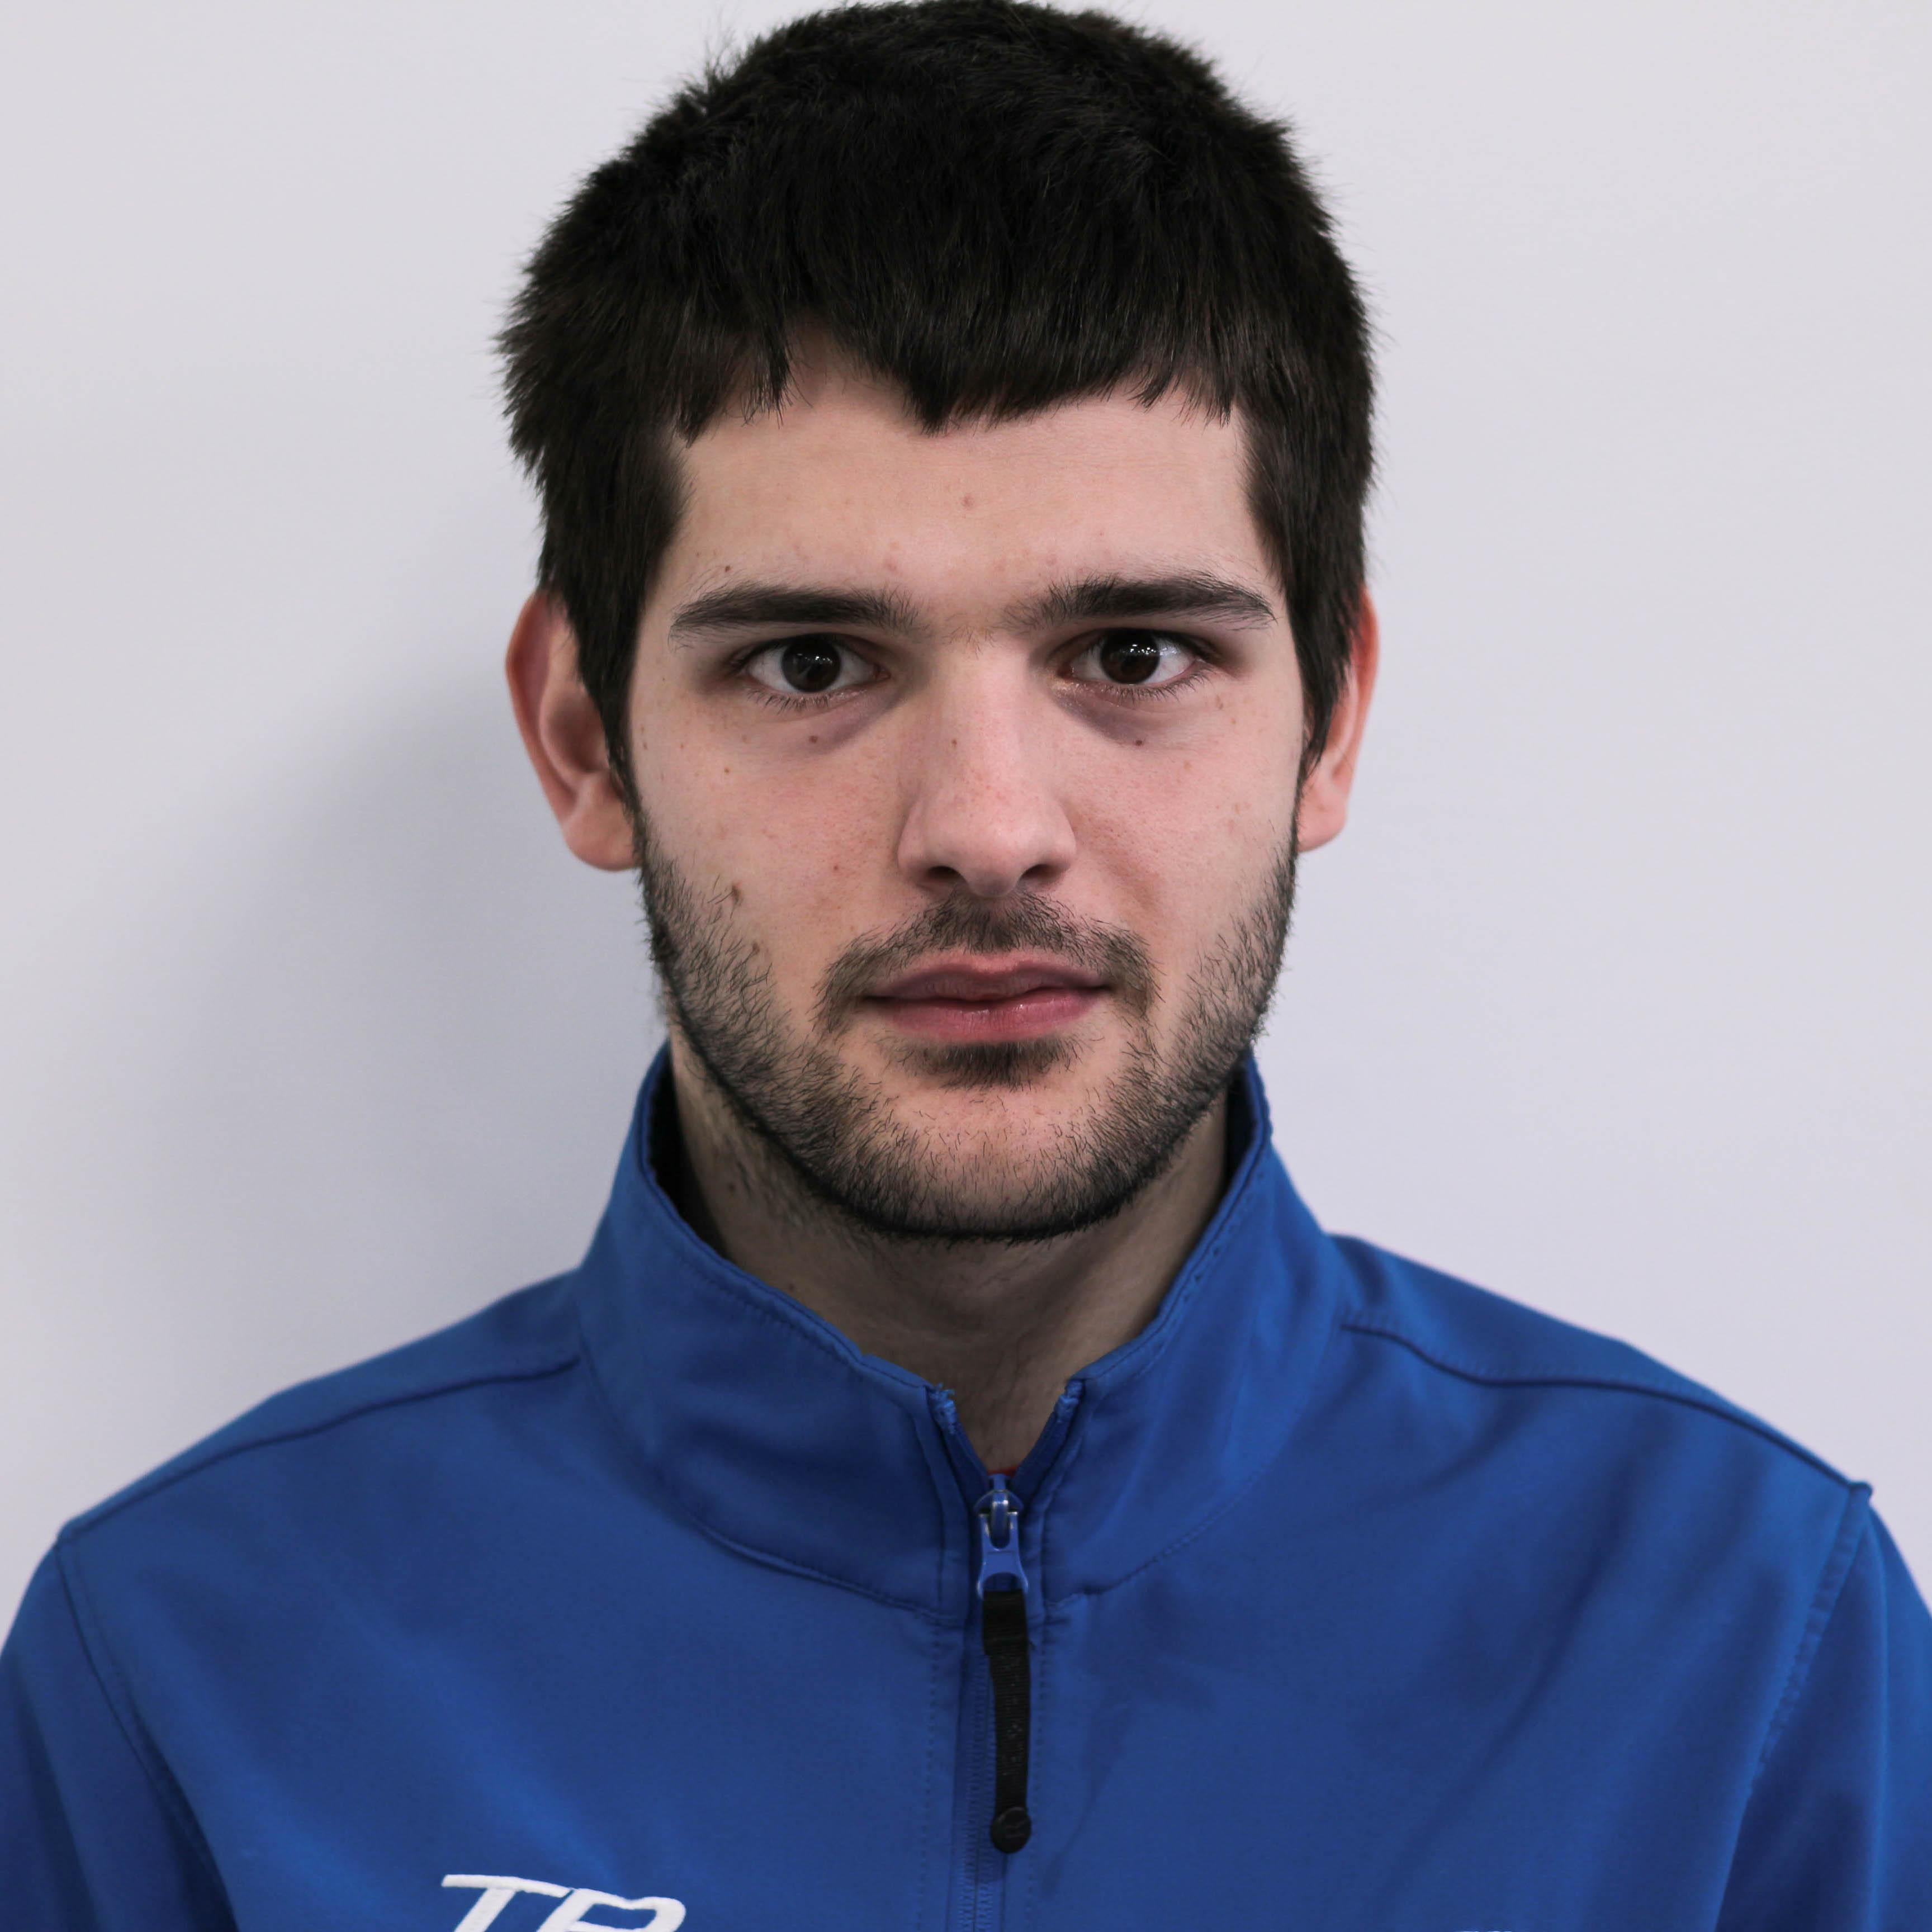 Kristiyan Ivanov